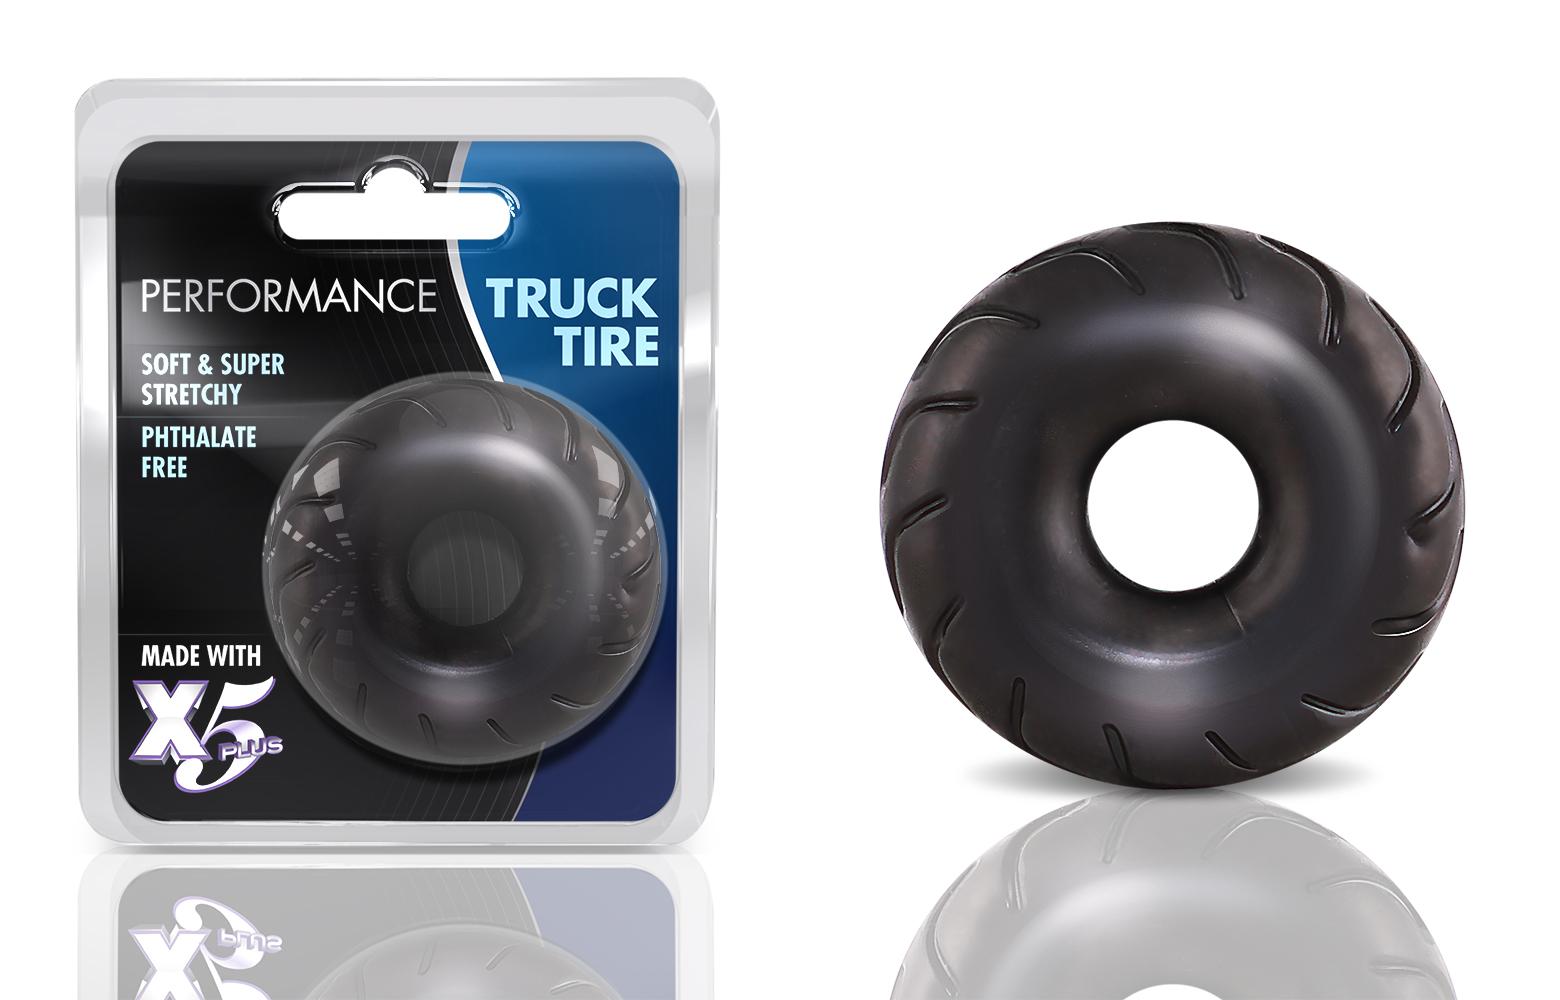 Performance - Truck Tire - Black